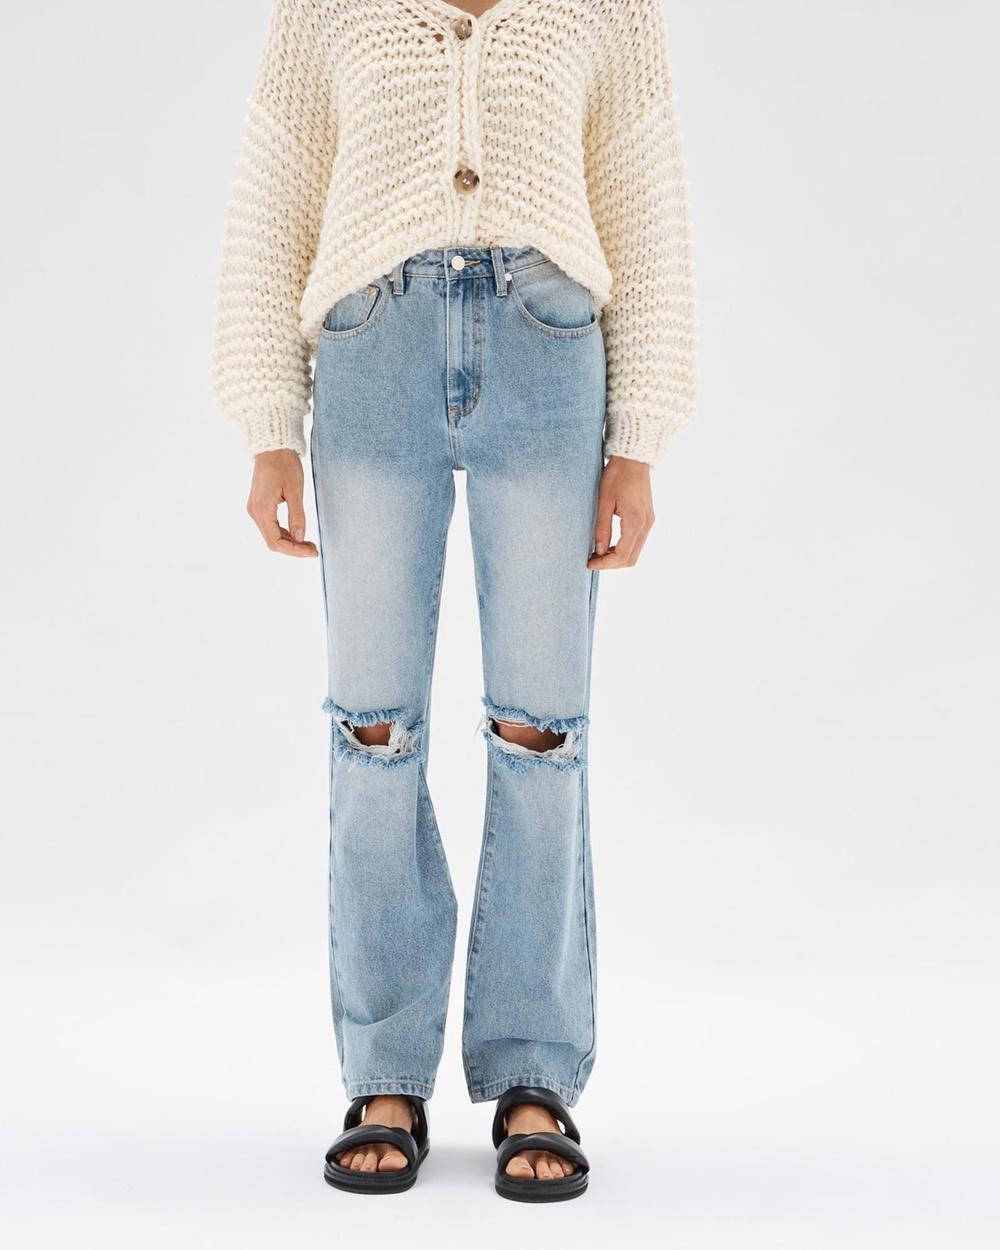 Staple the Label Muse Distressed Jeans Slim Vintage Blue